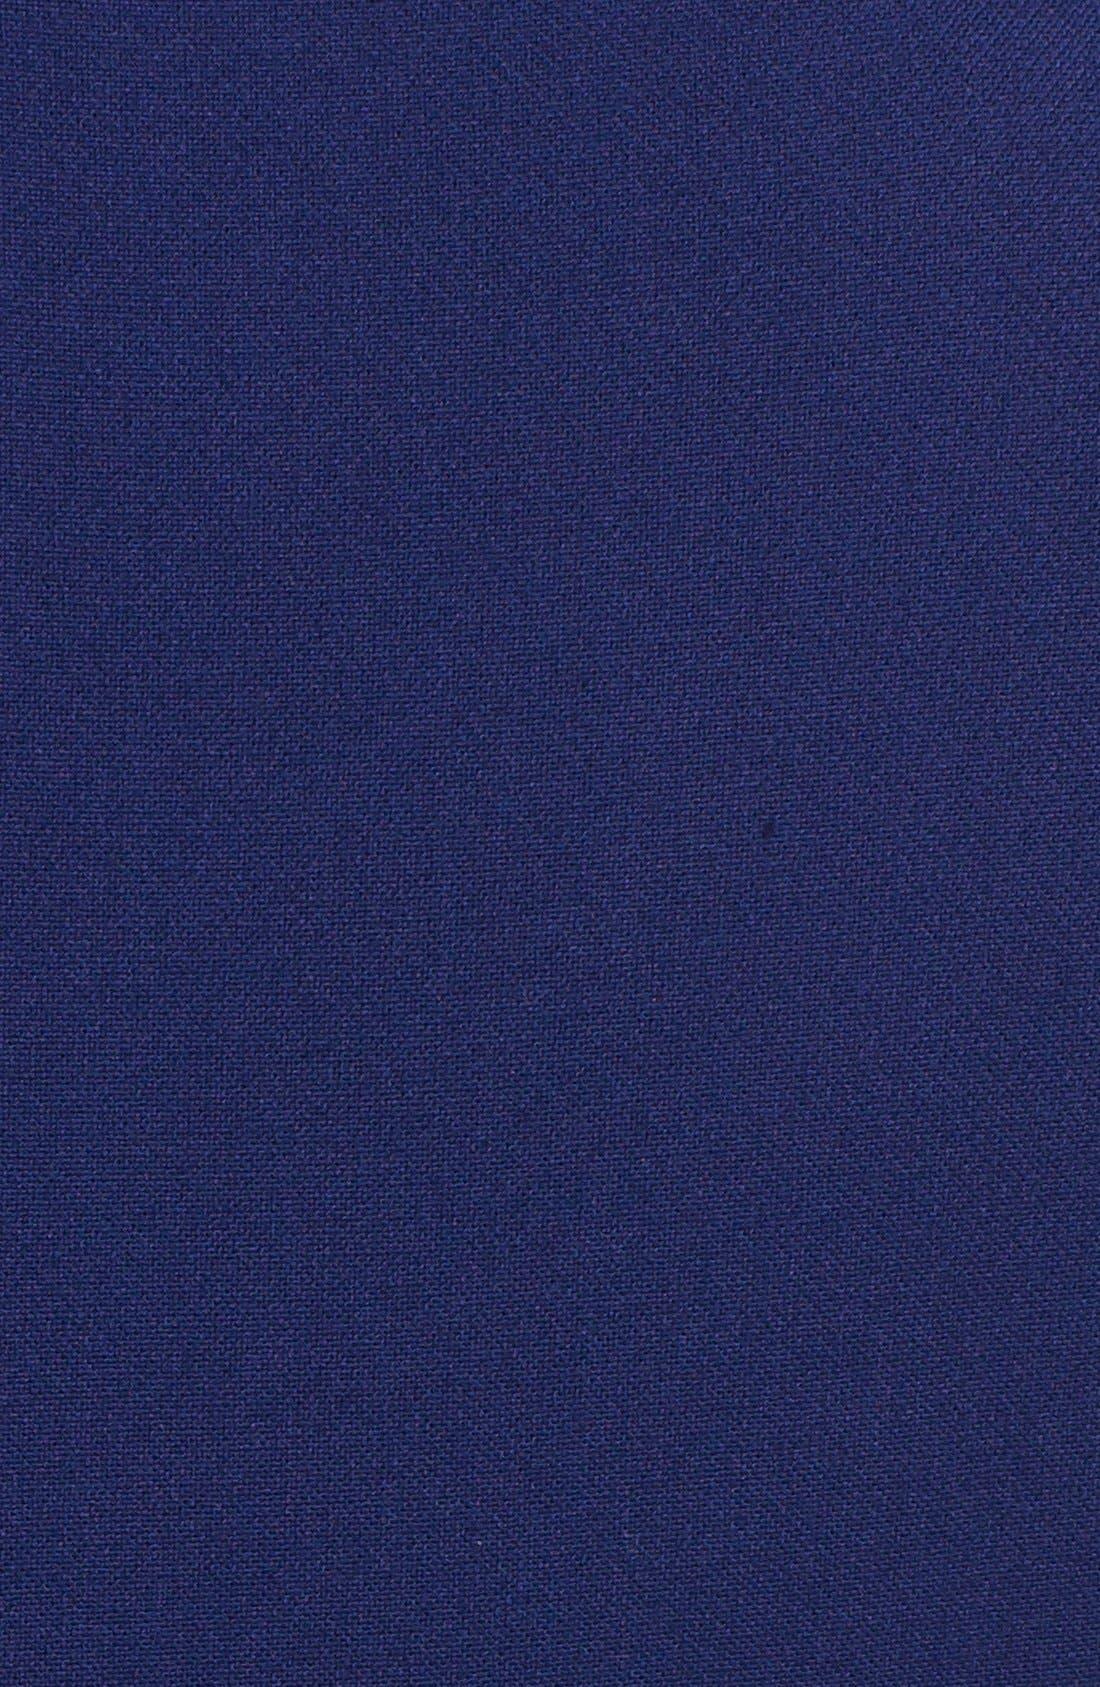 Alternate Image 3  - BCBGMAXAZRIA 'Hannah' Colorblock Fit & Flare Dress